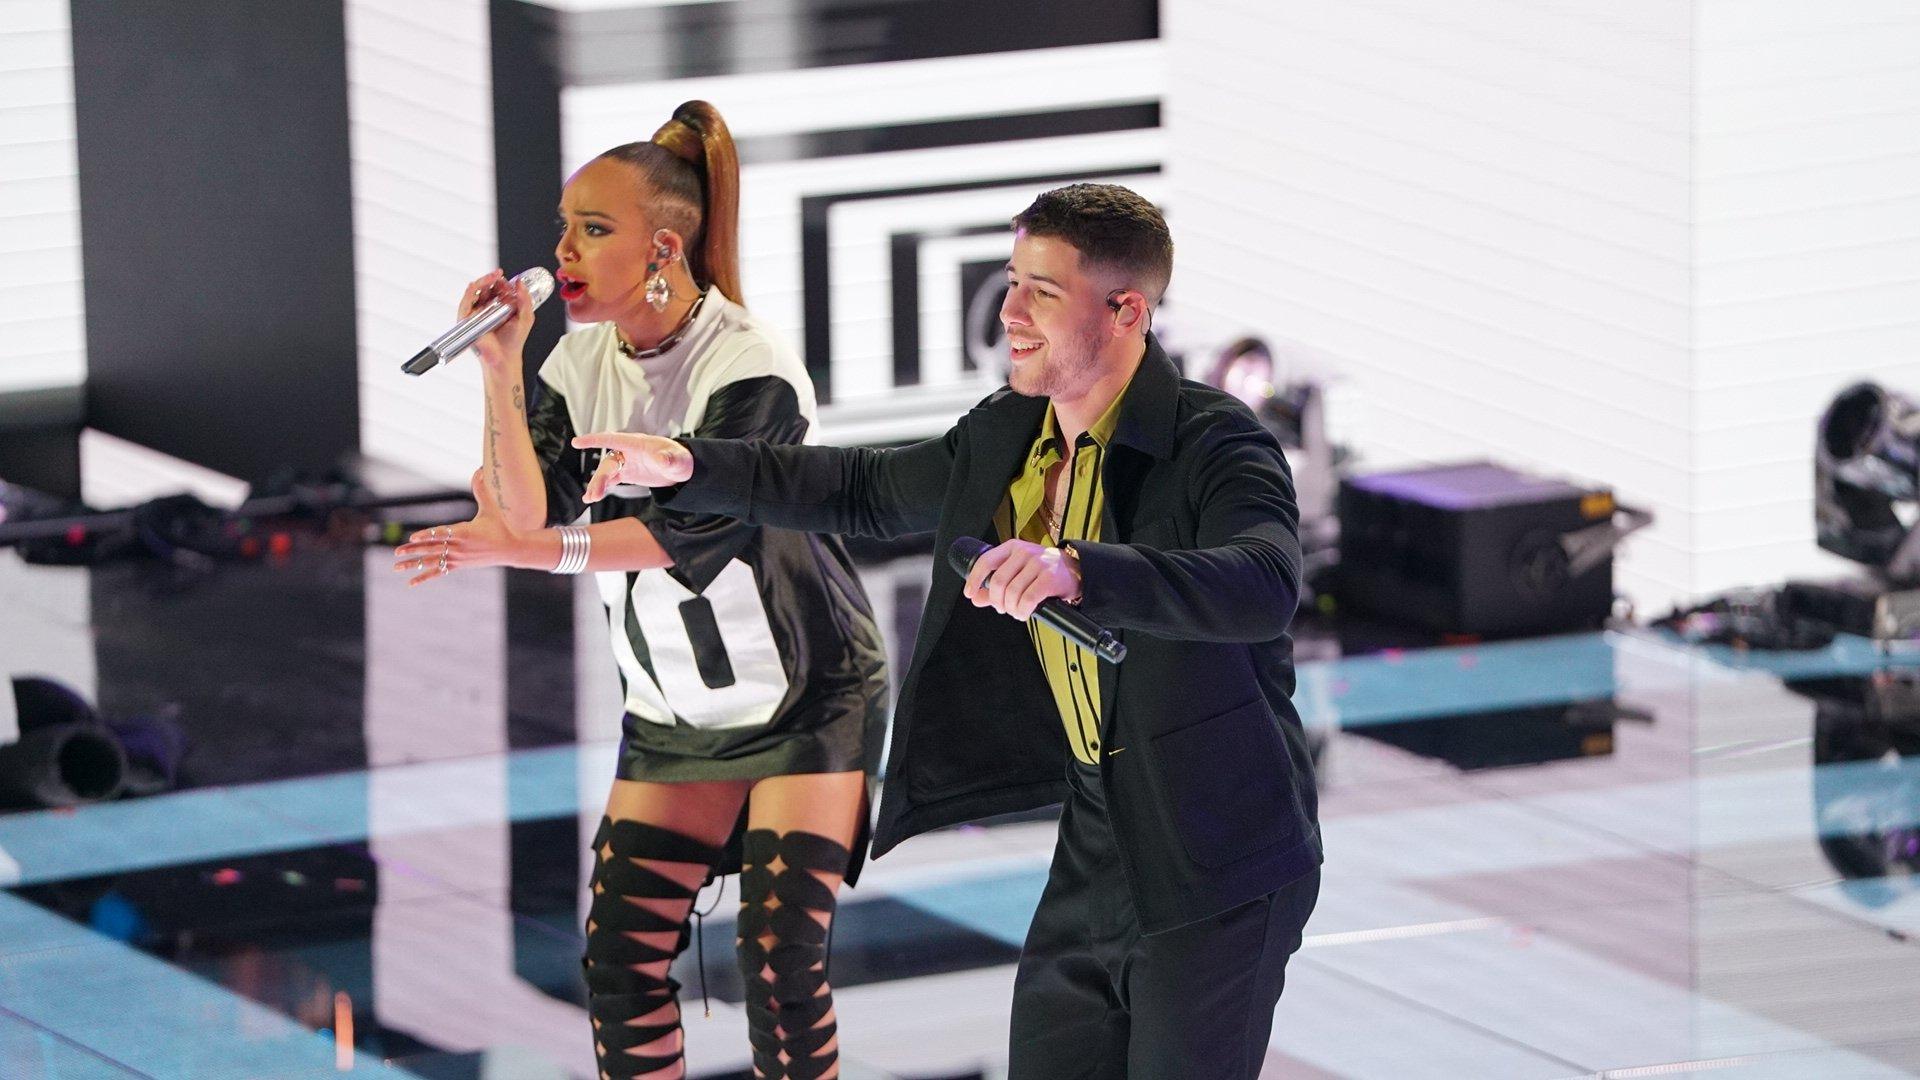 We are JEALOUS of @Jurnee and @nickjonas and their amazing talent! #AmericanIdol #IdolFinale https://t.co/EzHdBDqOeZ